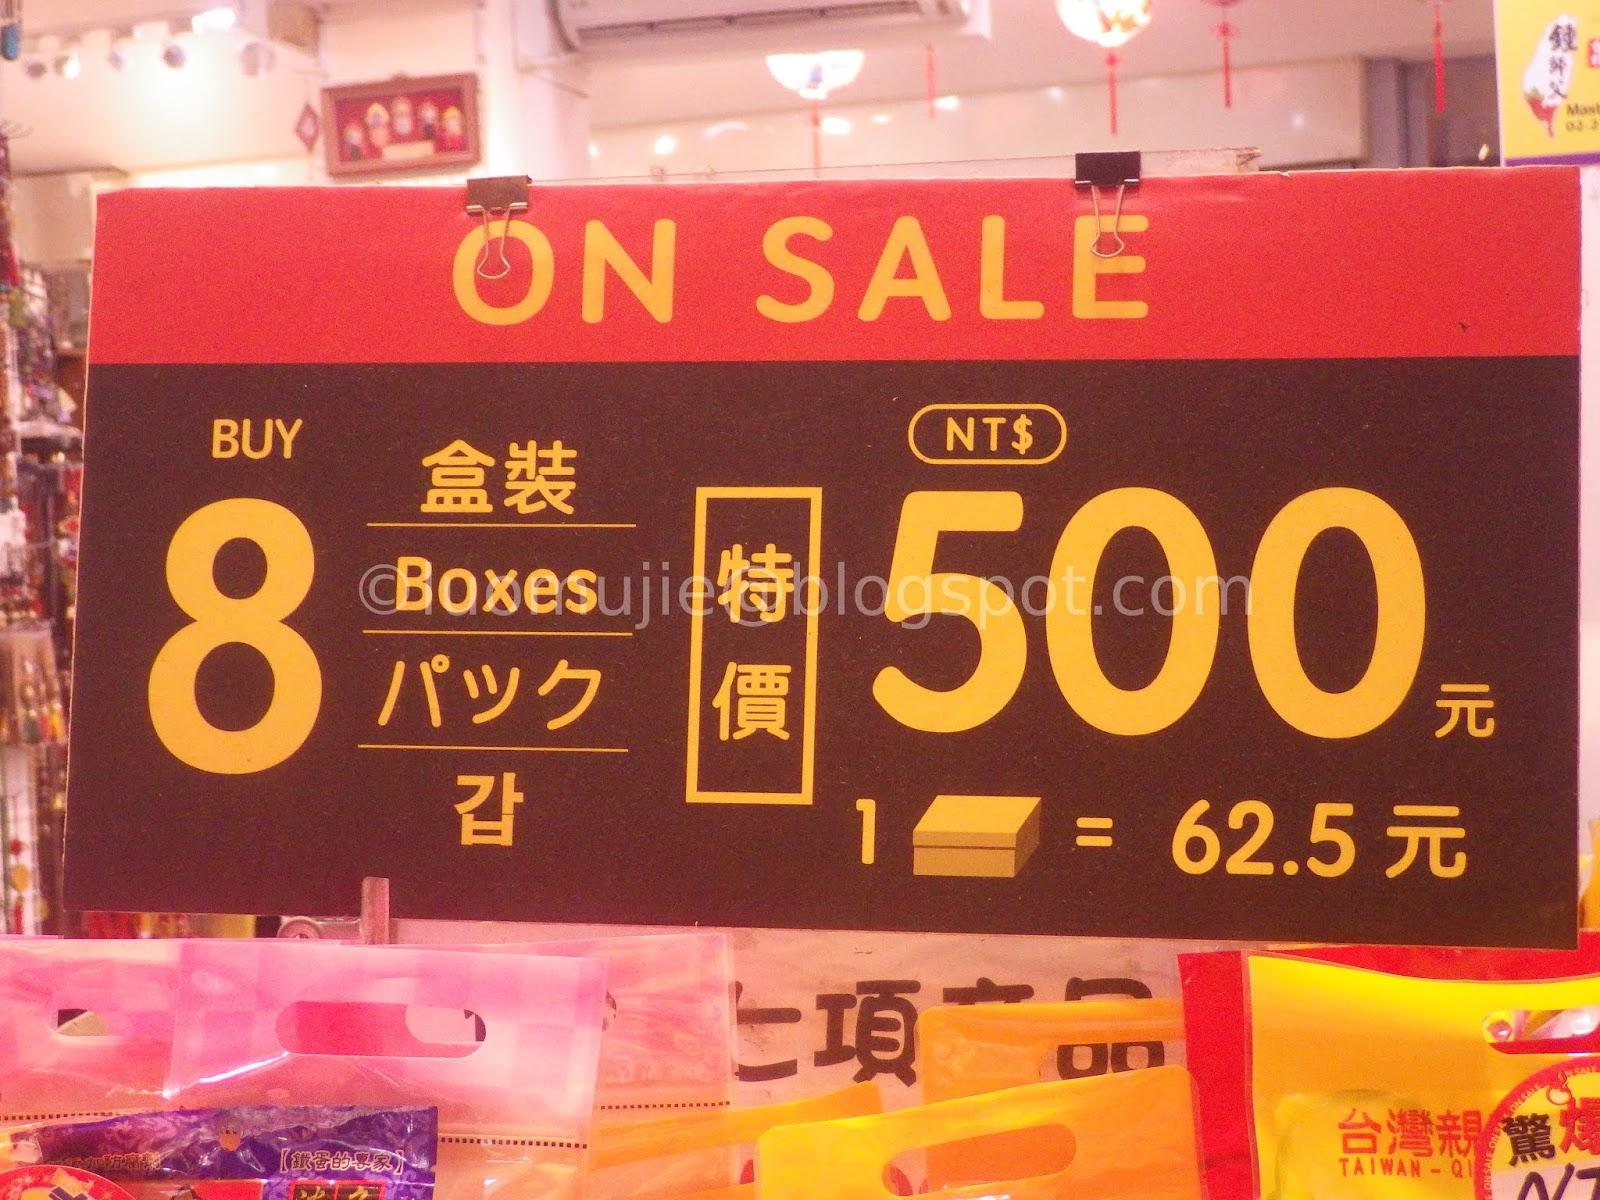 where to buy cheapest pineapple cake in Taipei